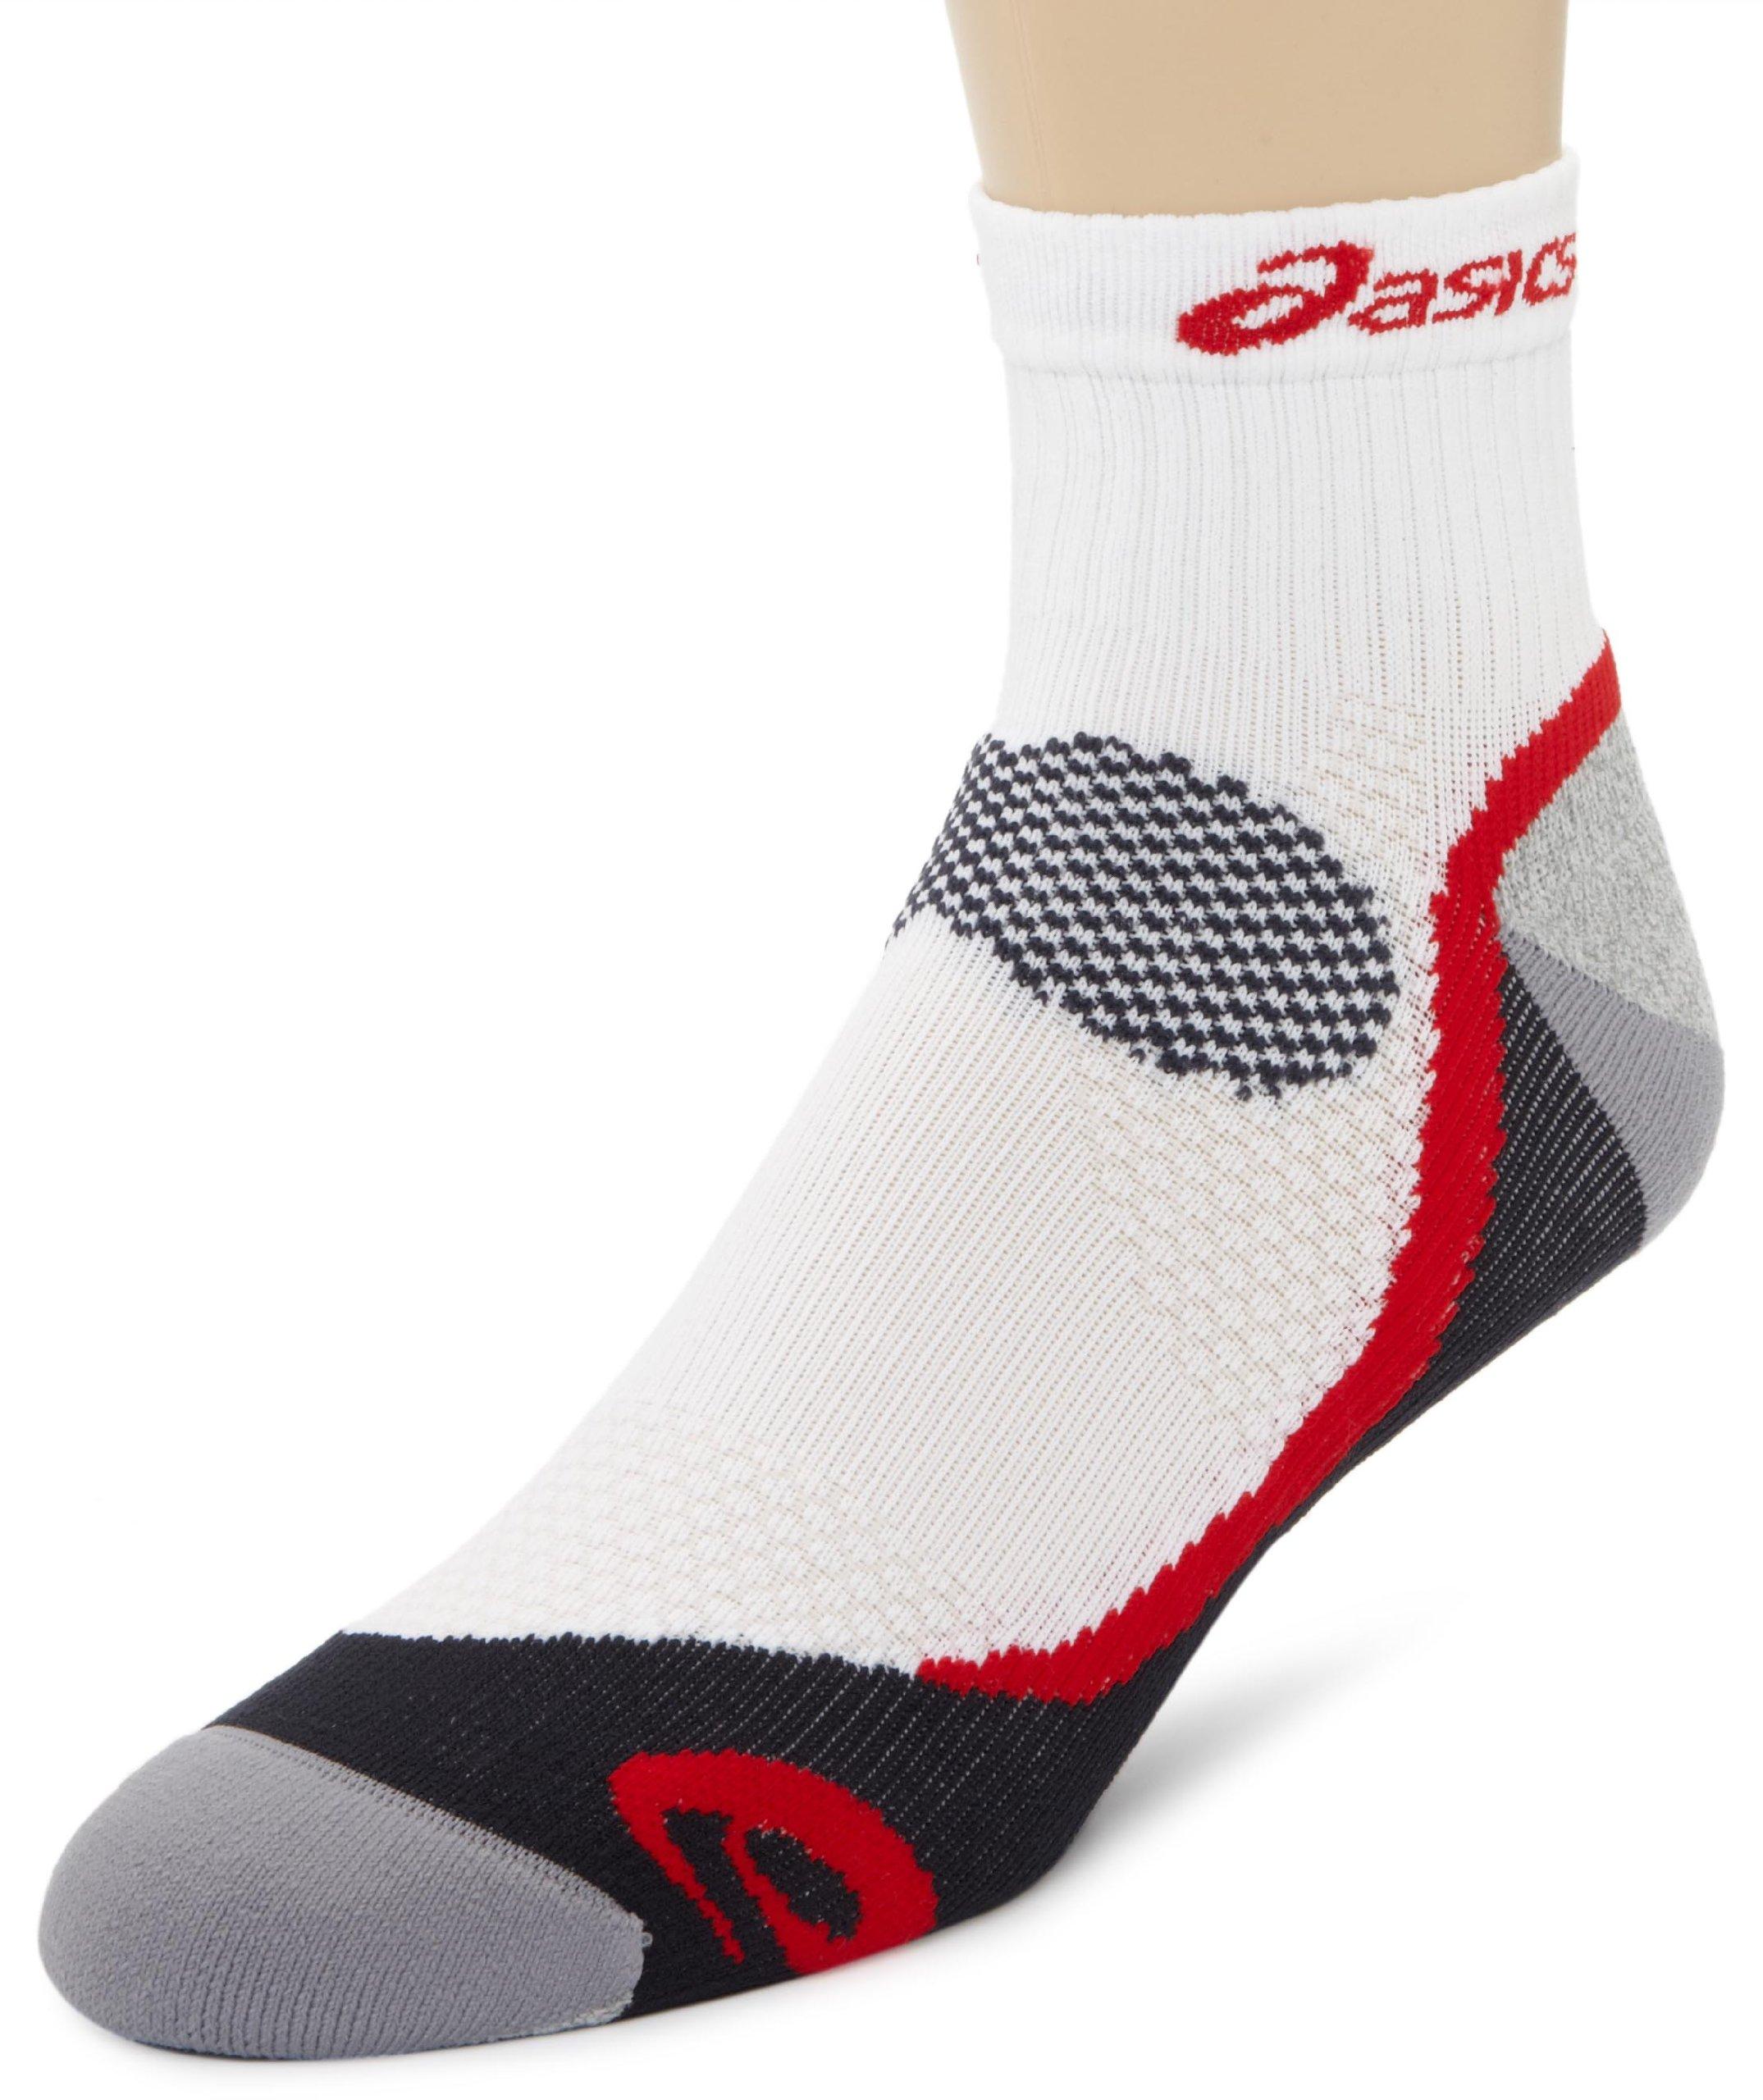 ASICS Kayano Classic Quarter Socks, White/Frost/Iron/Sport Red, 1-Pair, X-Small